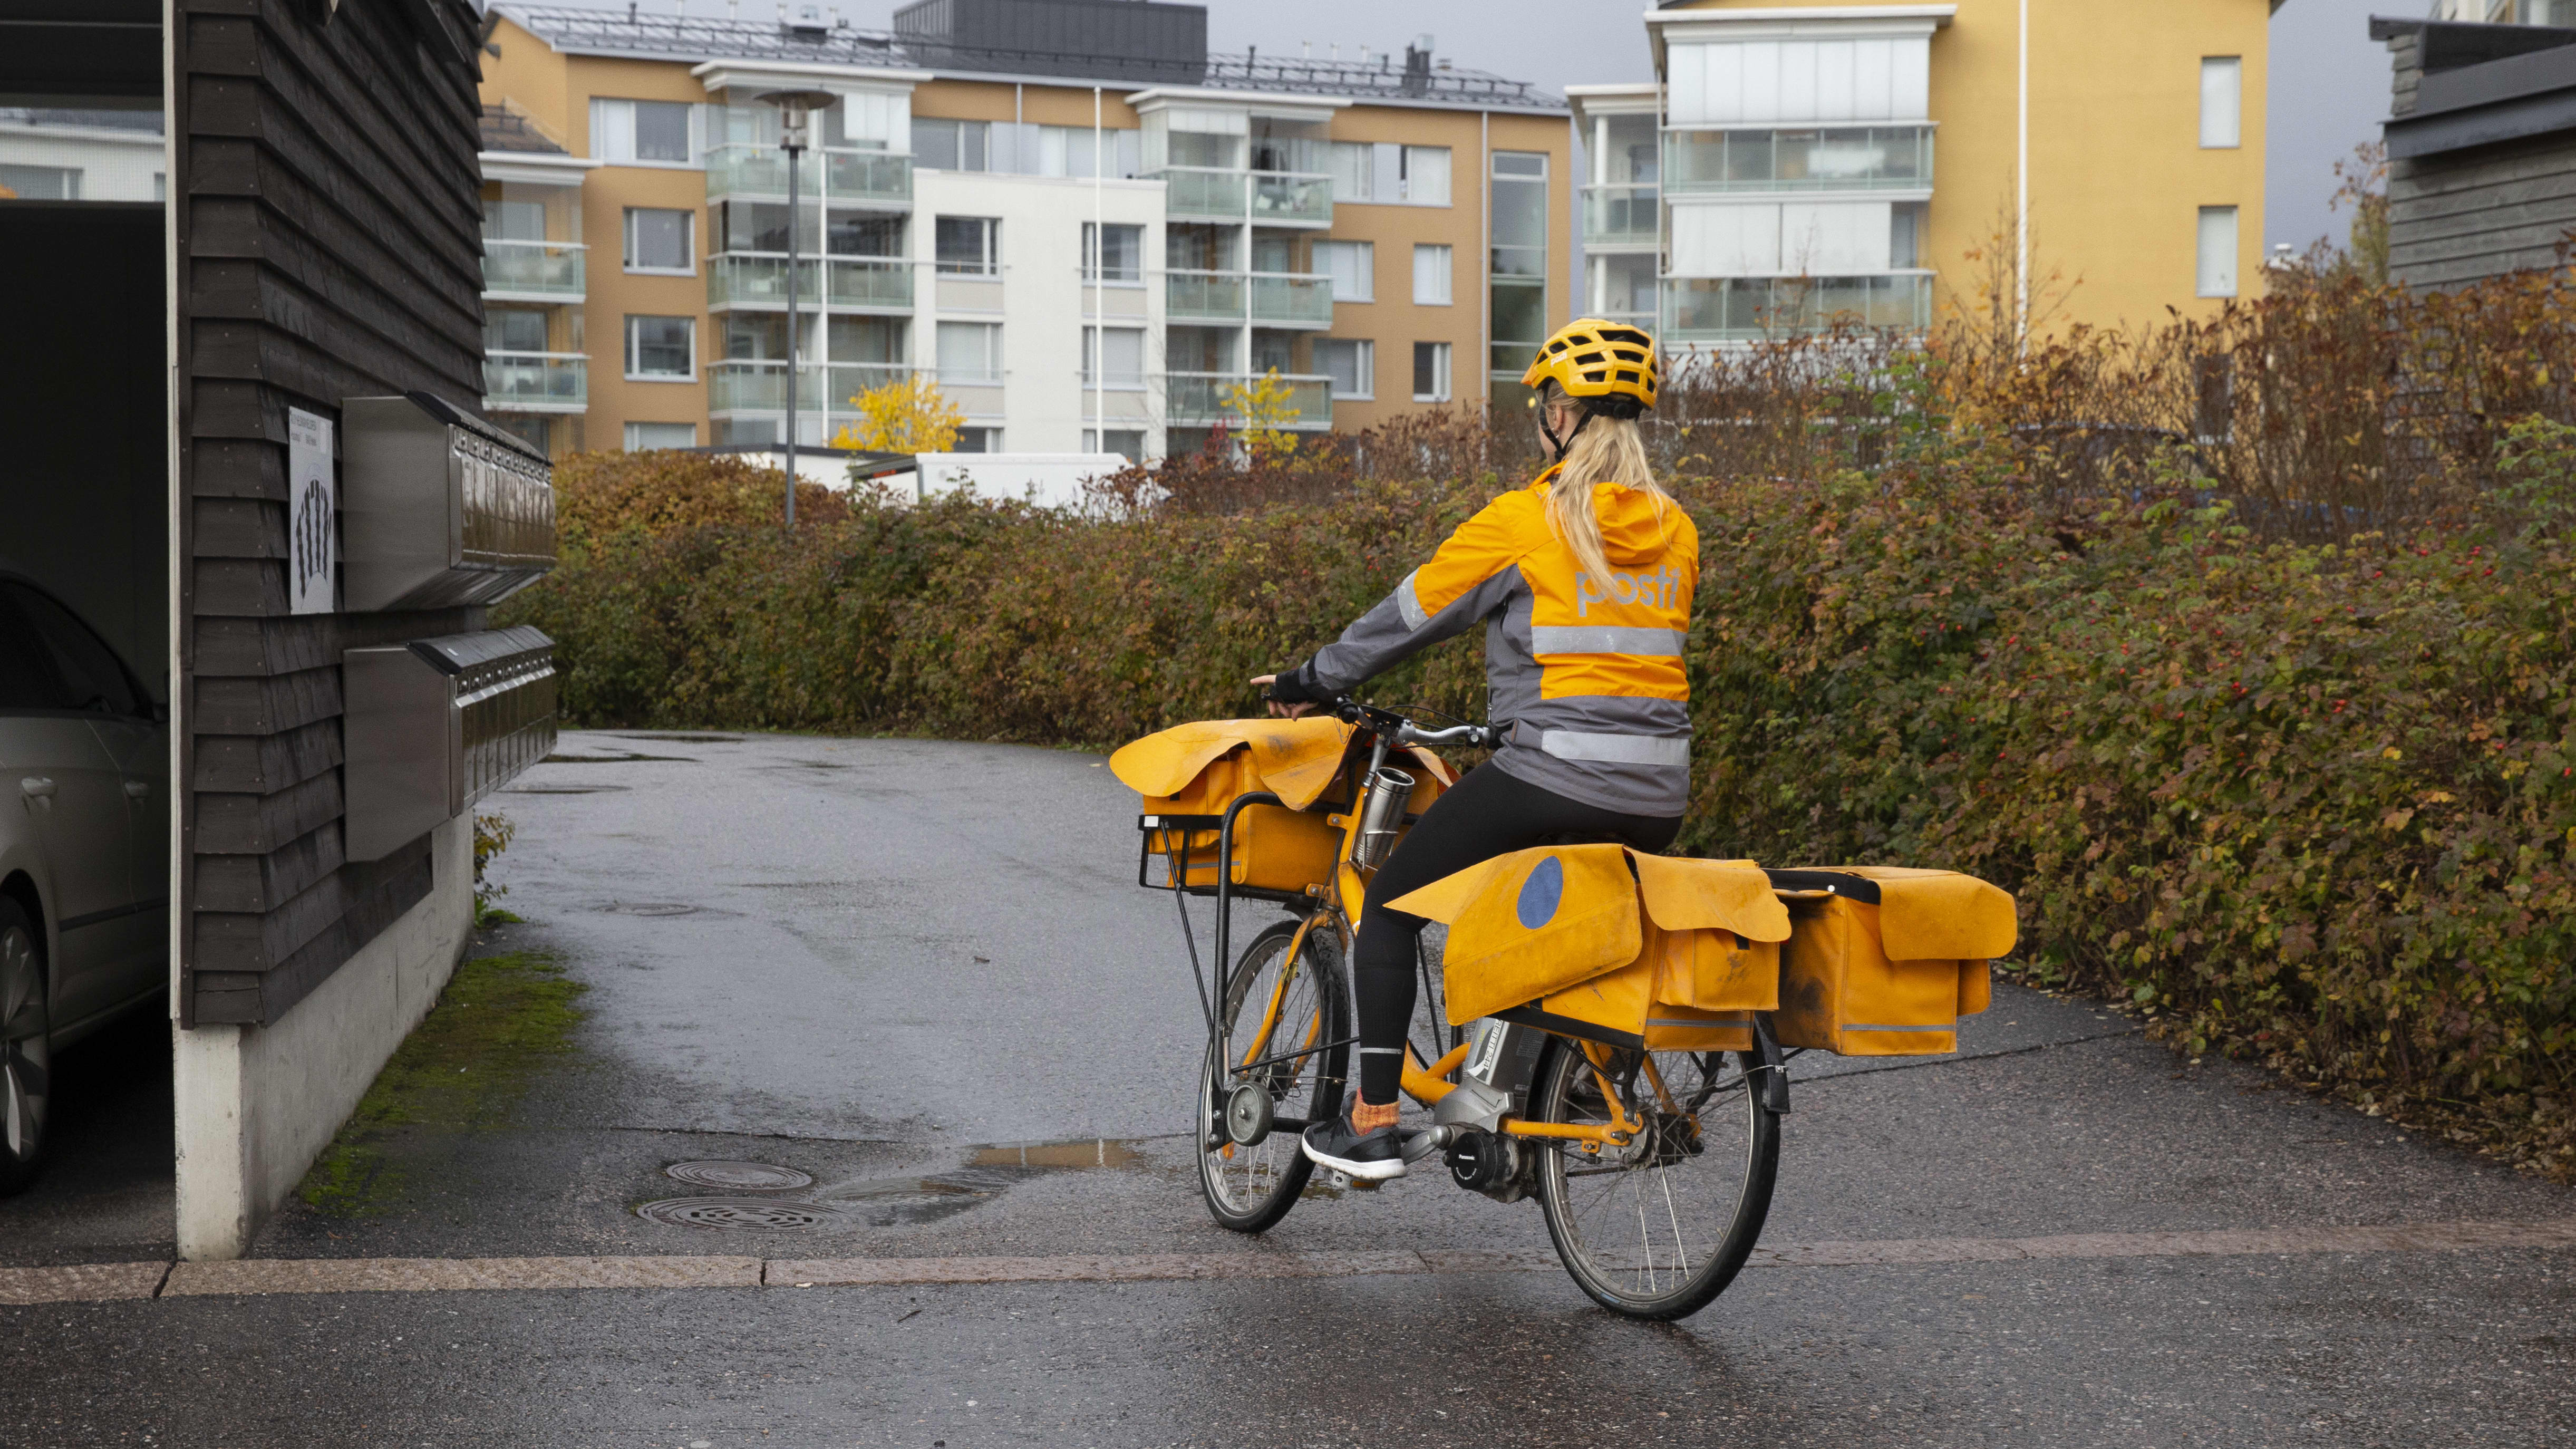 Sara Luostainen / postinjakaja / postinjakaja / Pasila 11.10.2019